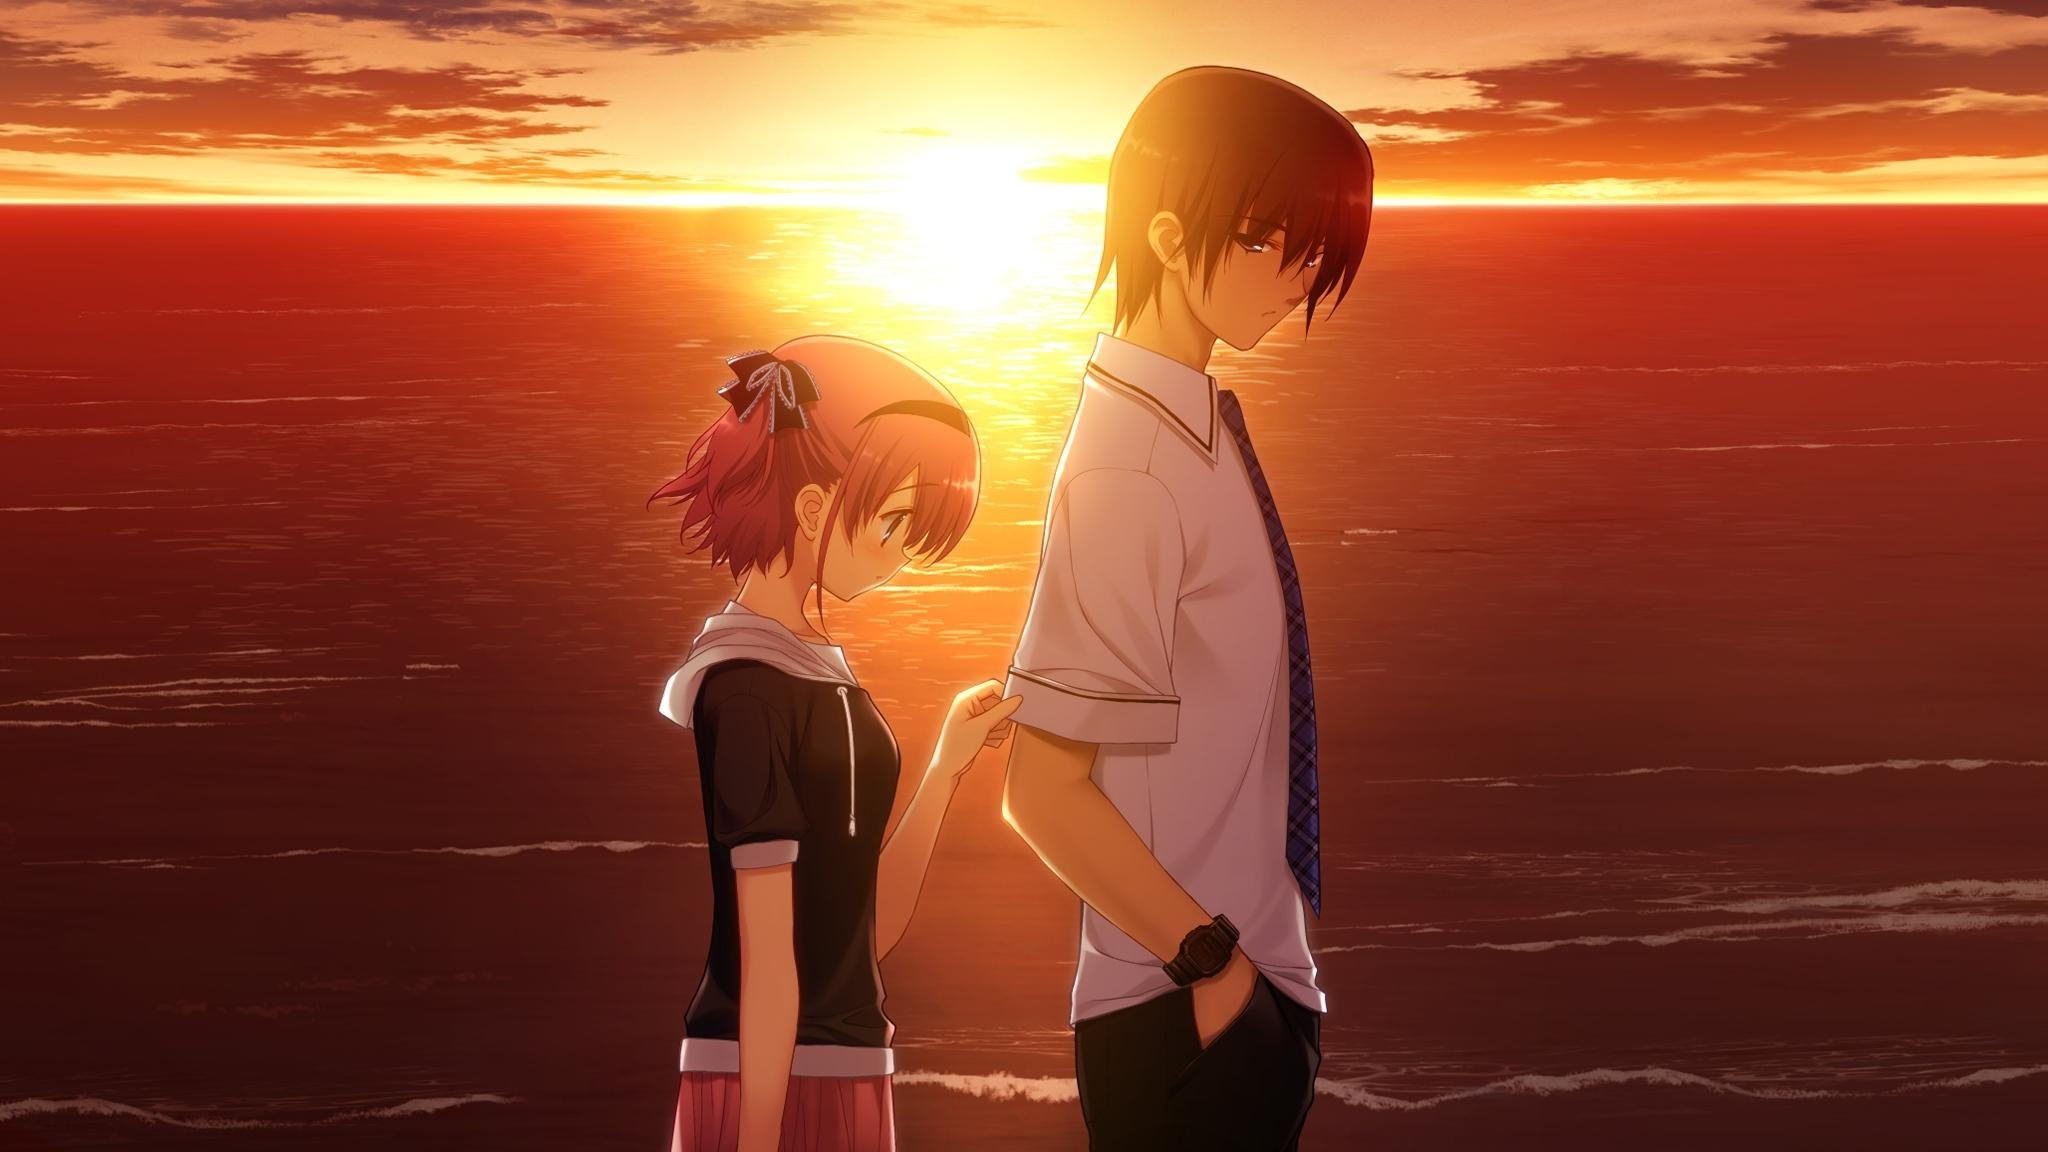 Sad Anime Couple